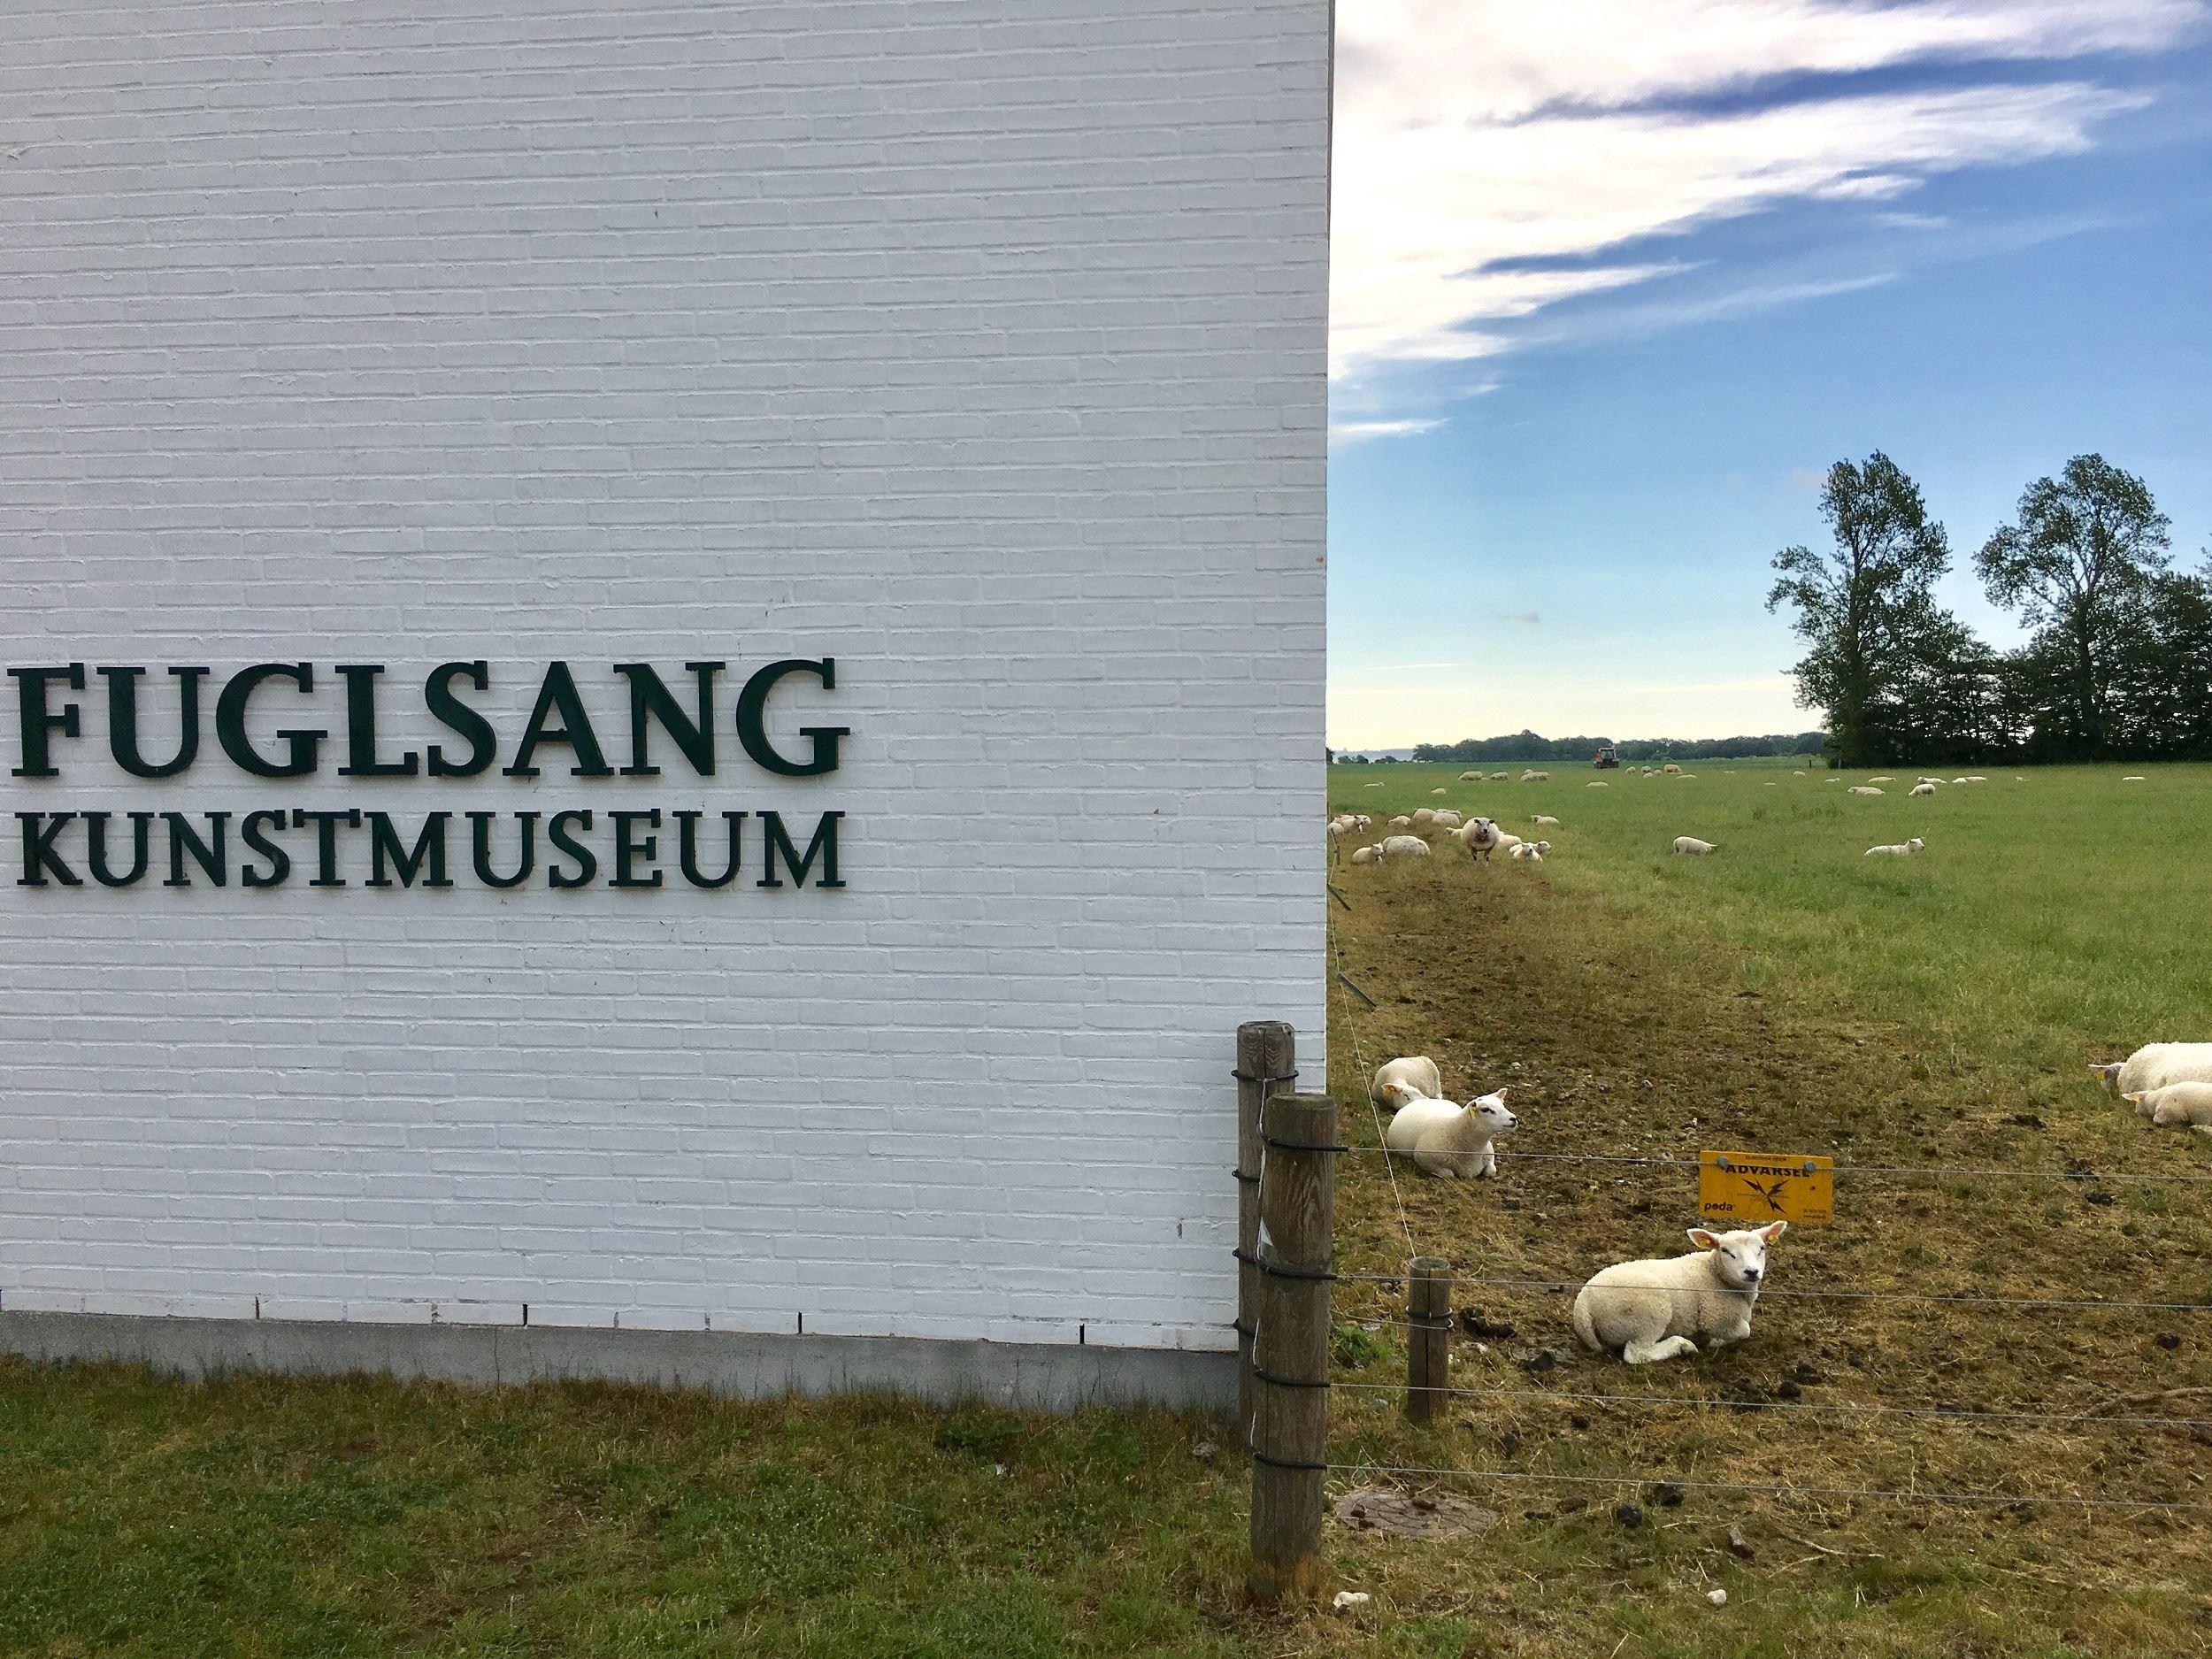 Fuglsang Kunstmuseum 10 år!